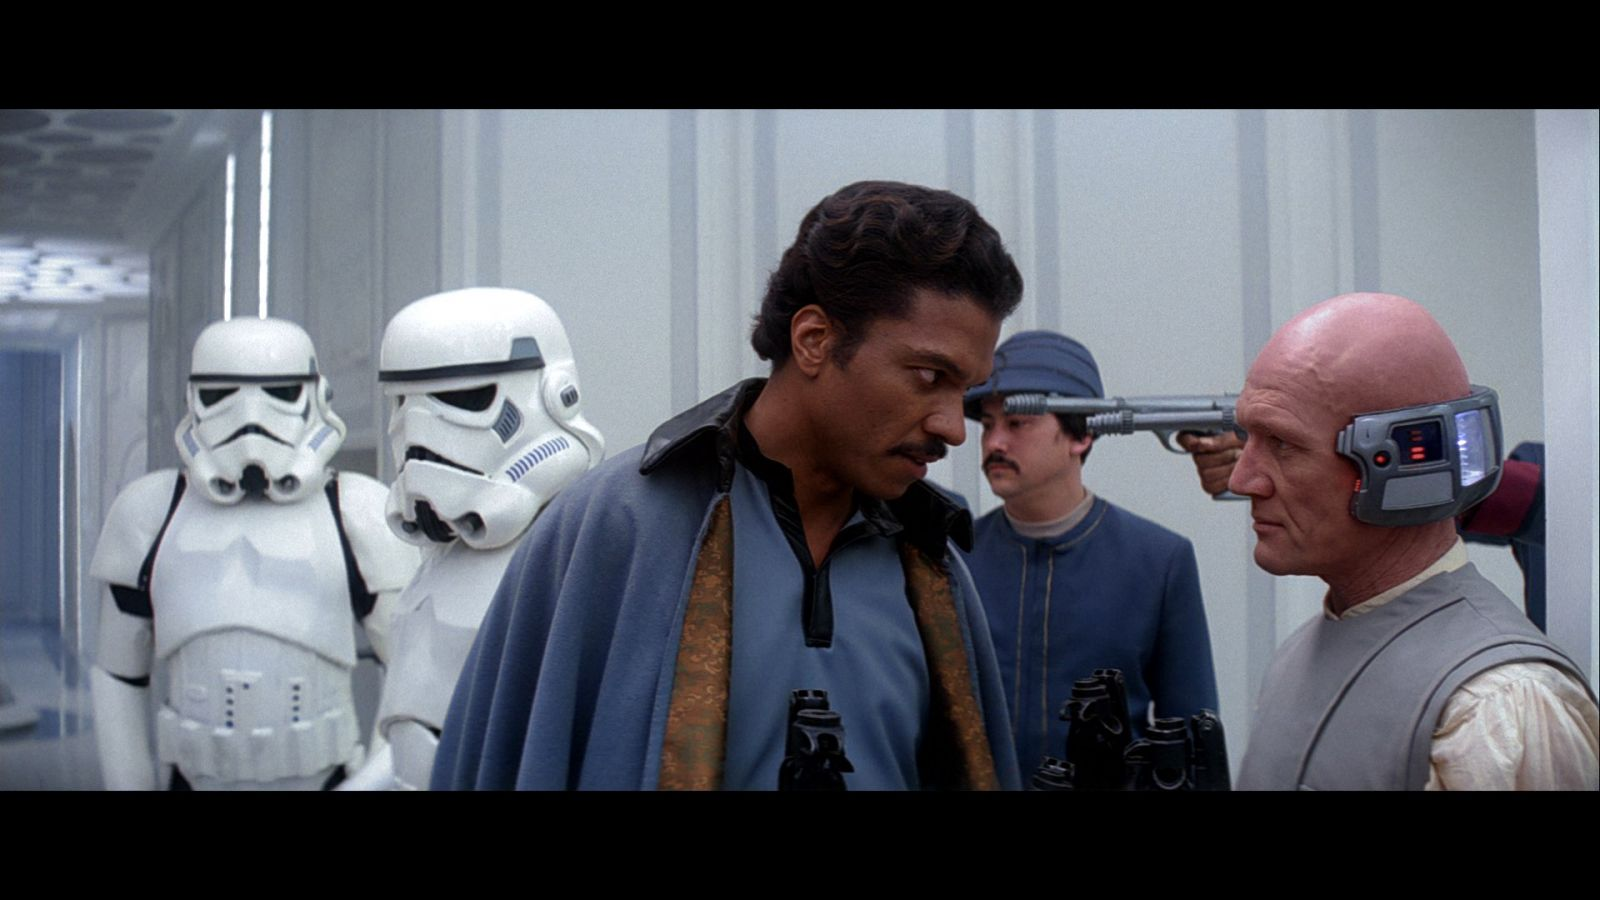 Star Wars Empire Strikes Back: Bluray Capture 106